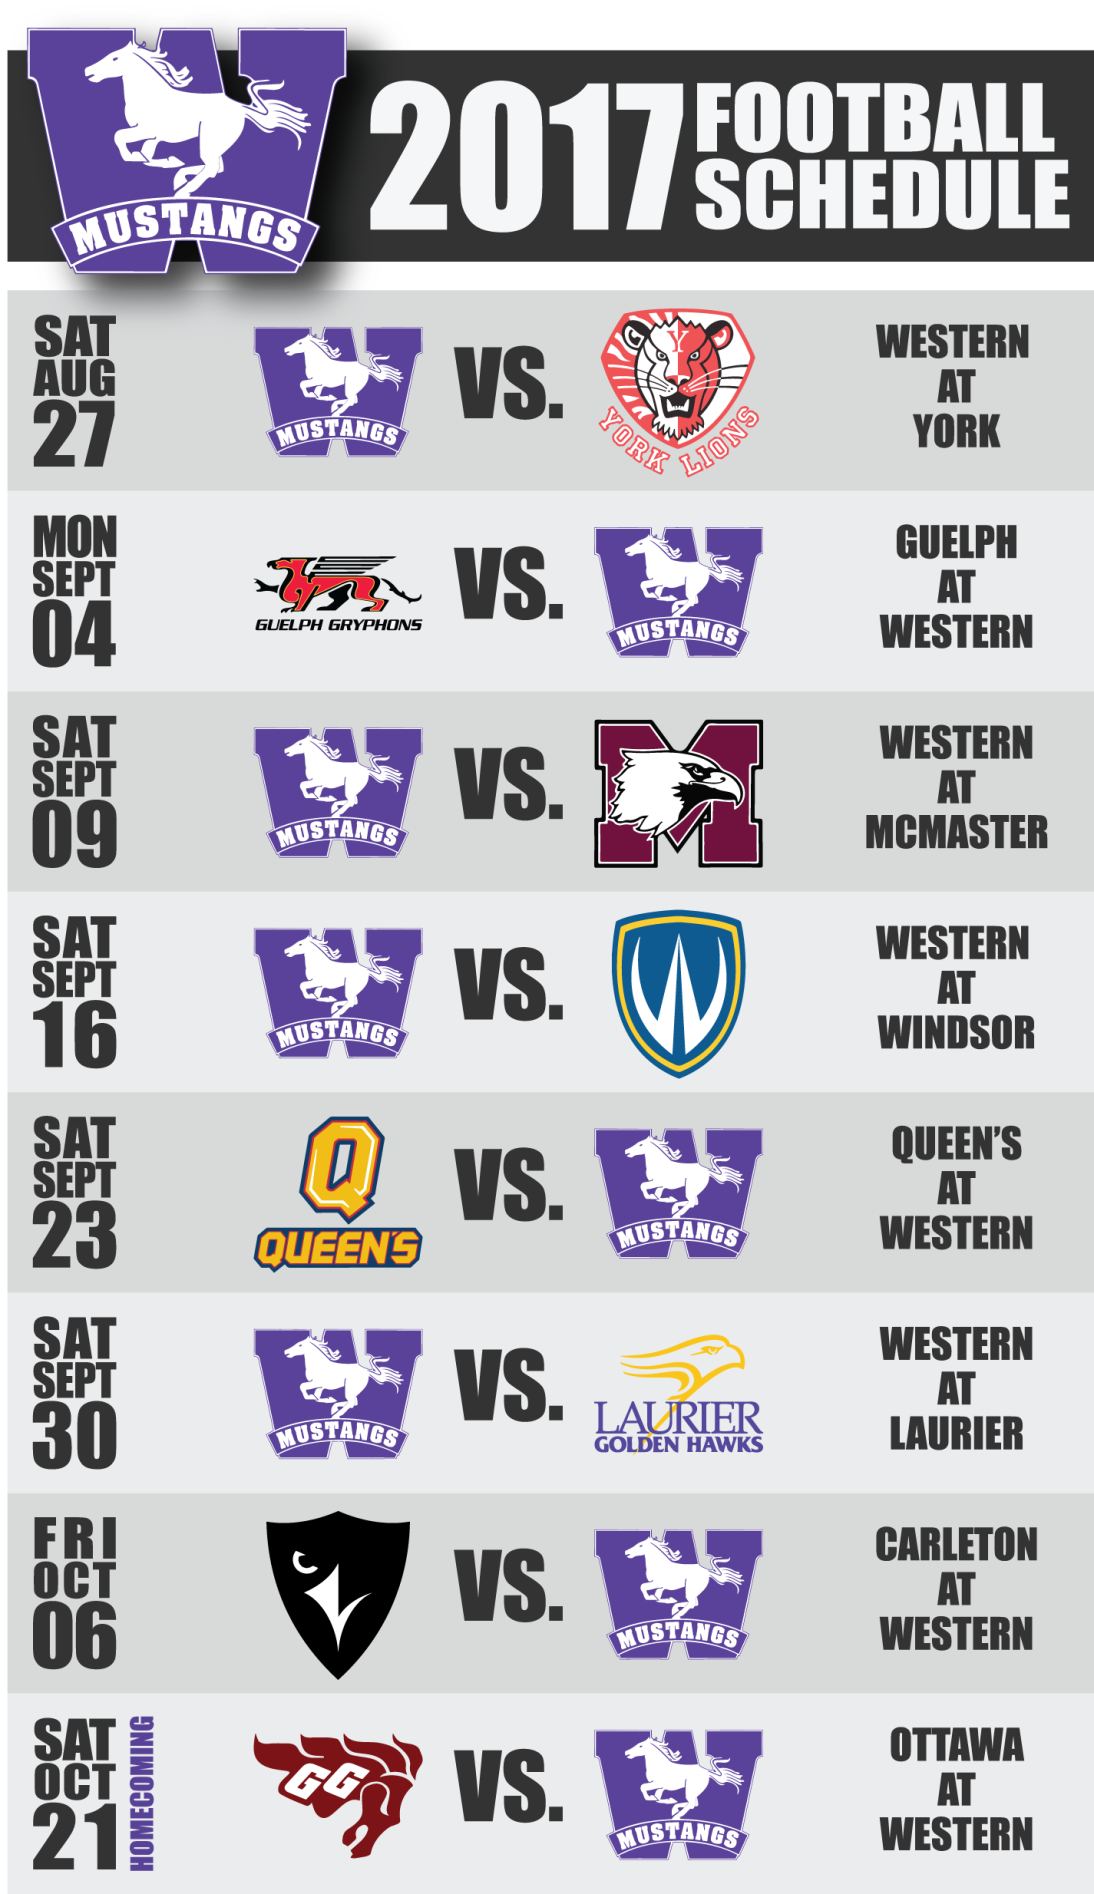 football schedule full